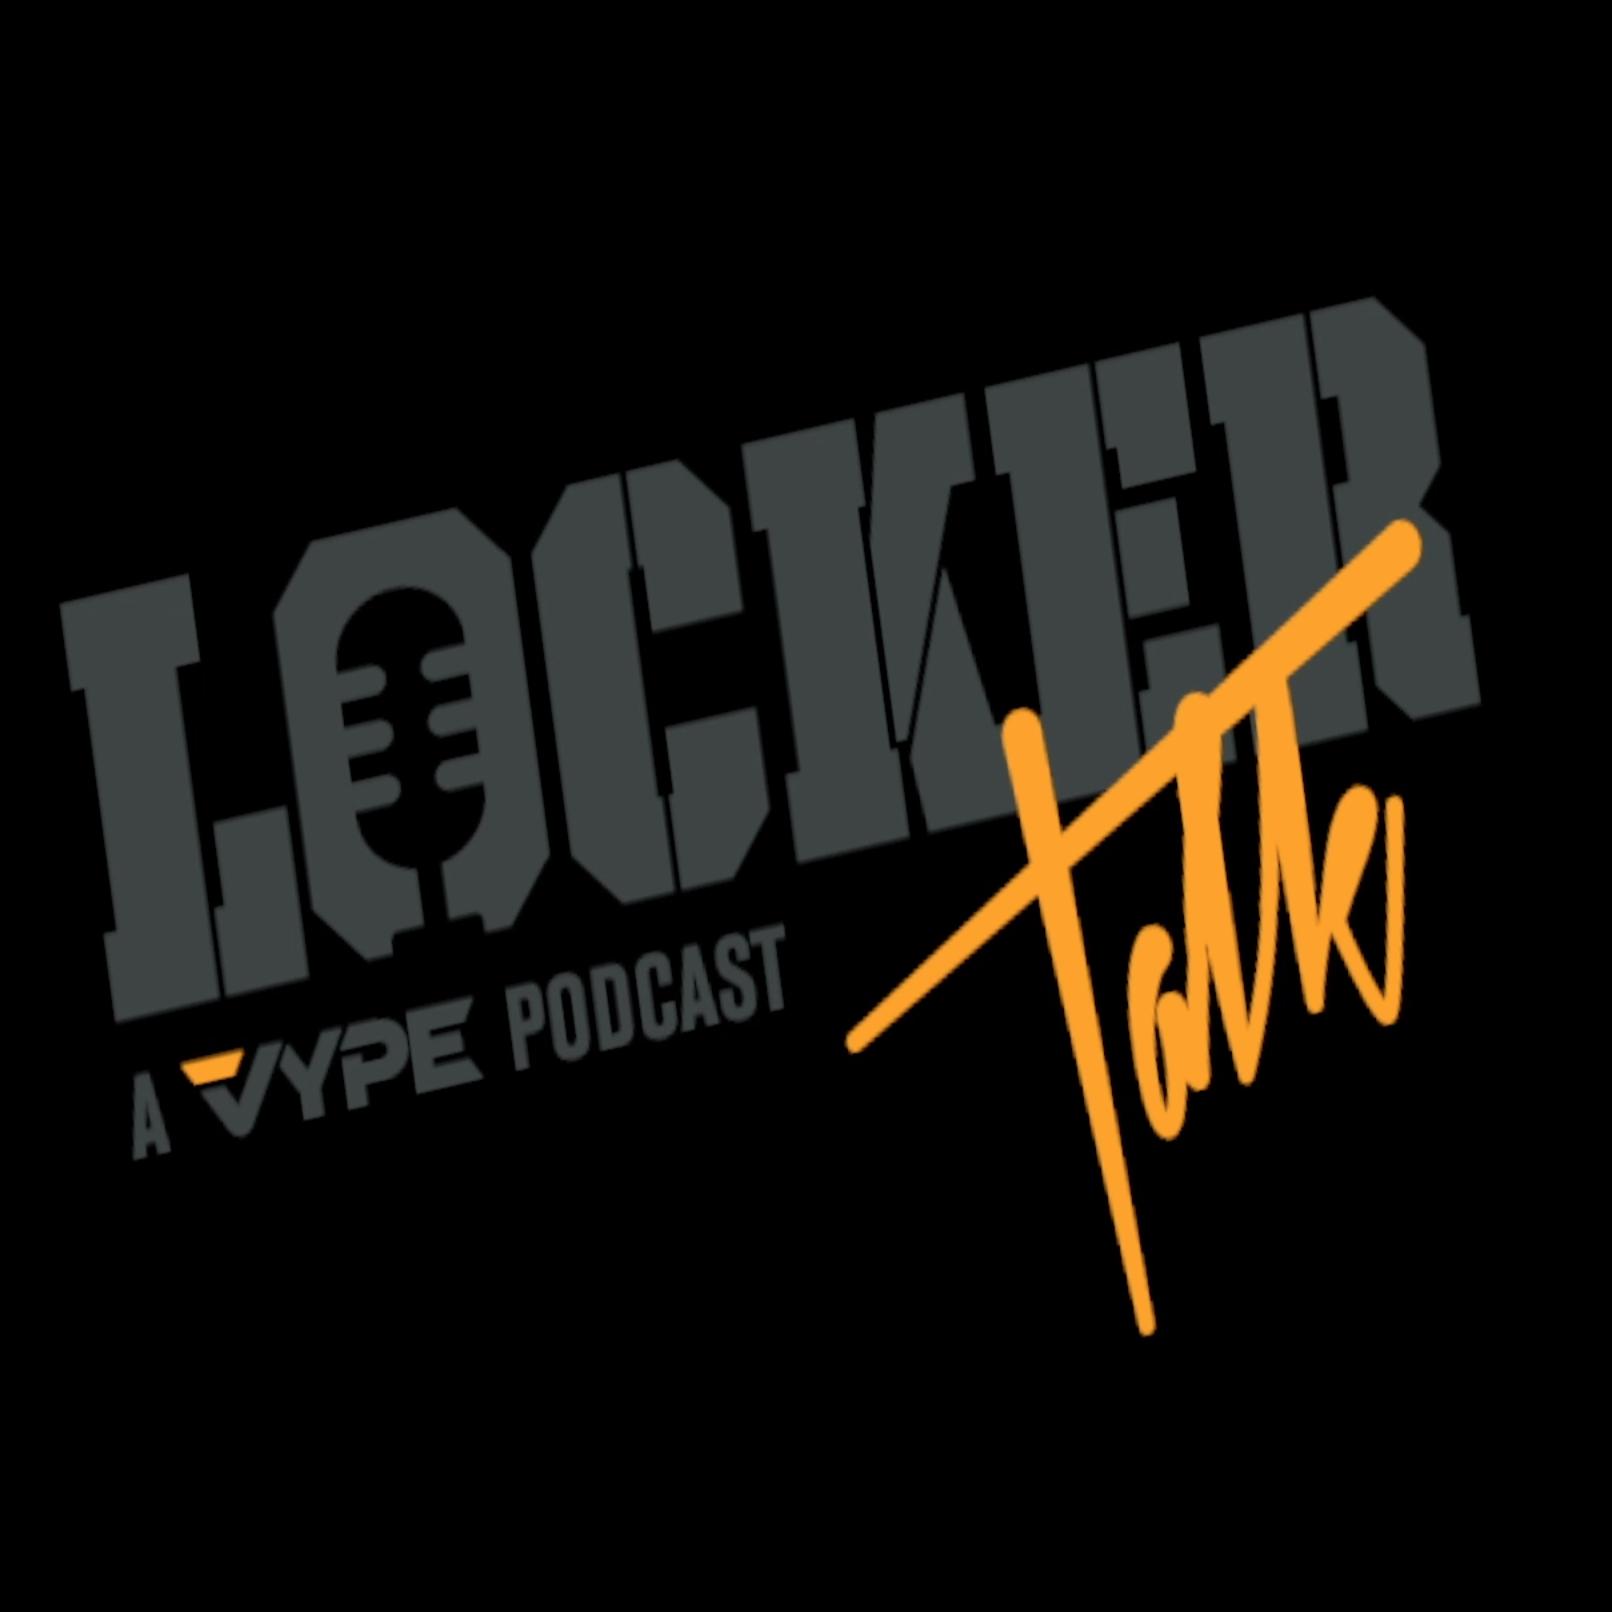 Locker Talk Presented by VYPE Media